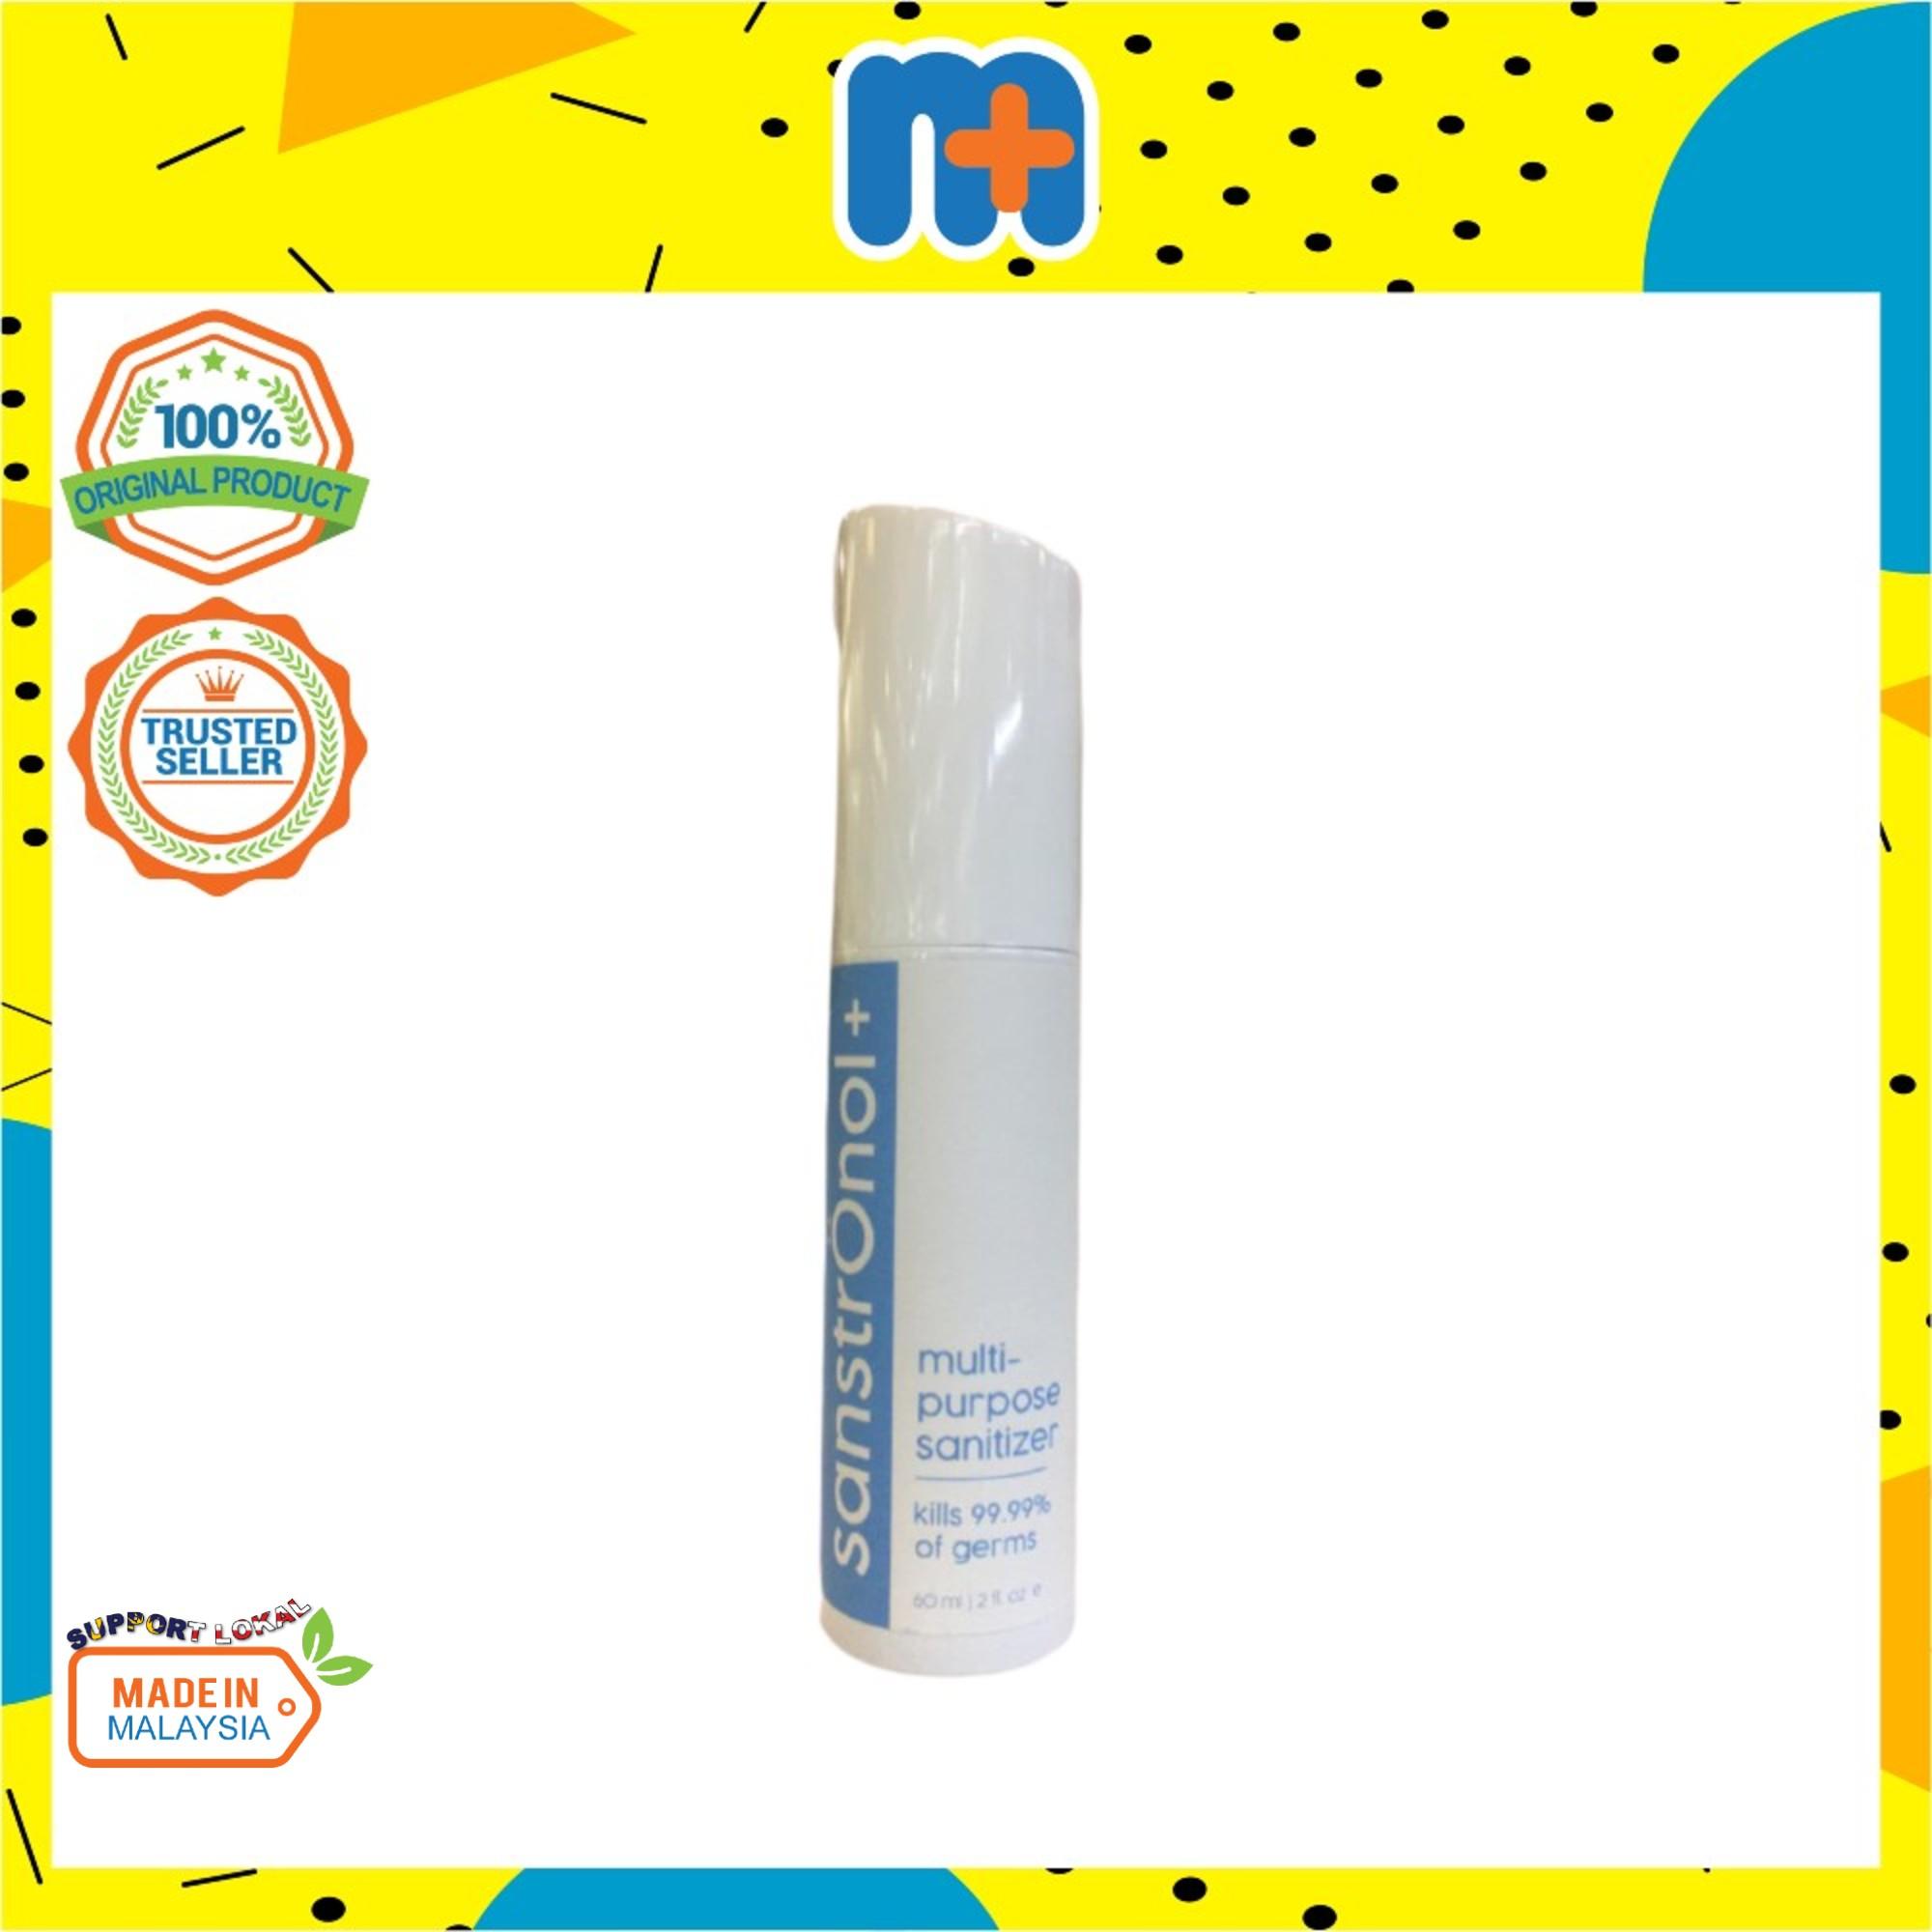 [MPLUS] SANSTRONOL+ Multi-Purpose Sanitizer 60ml